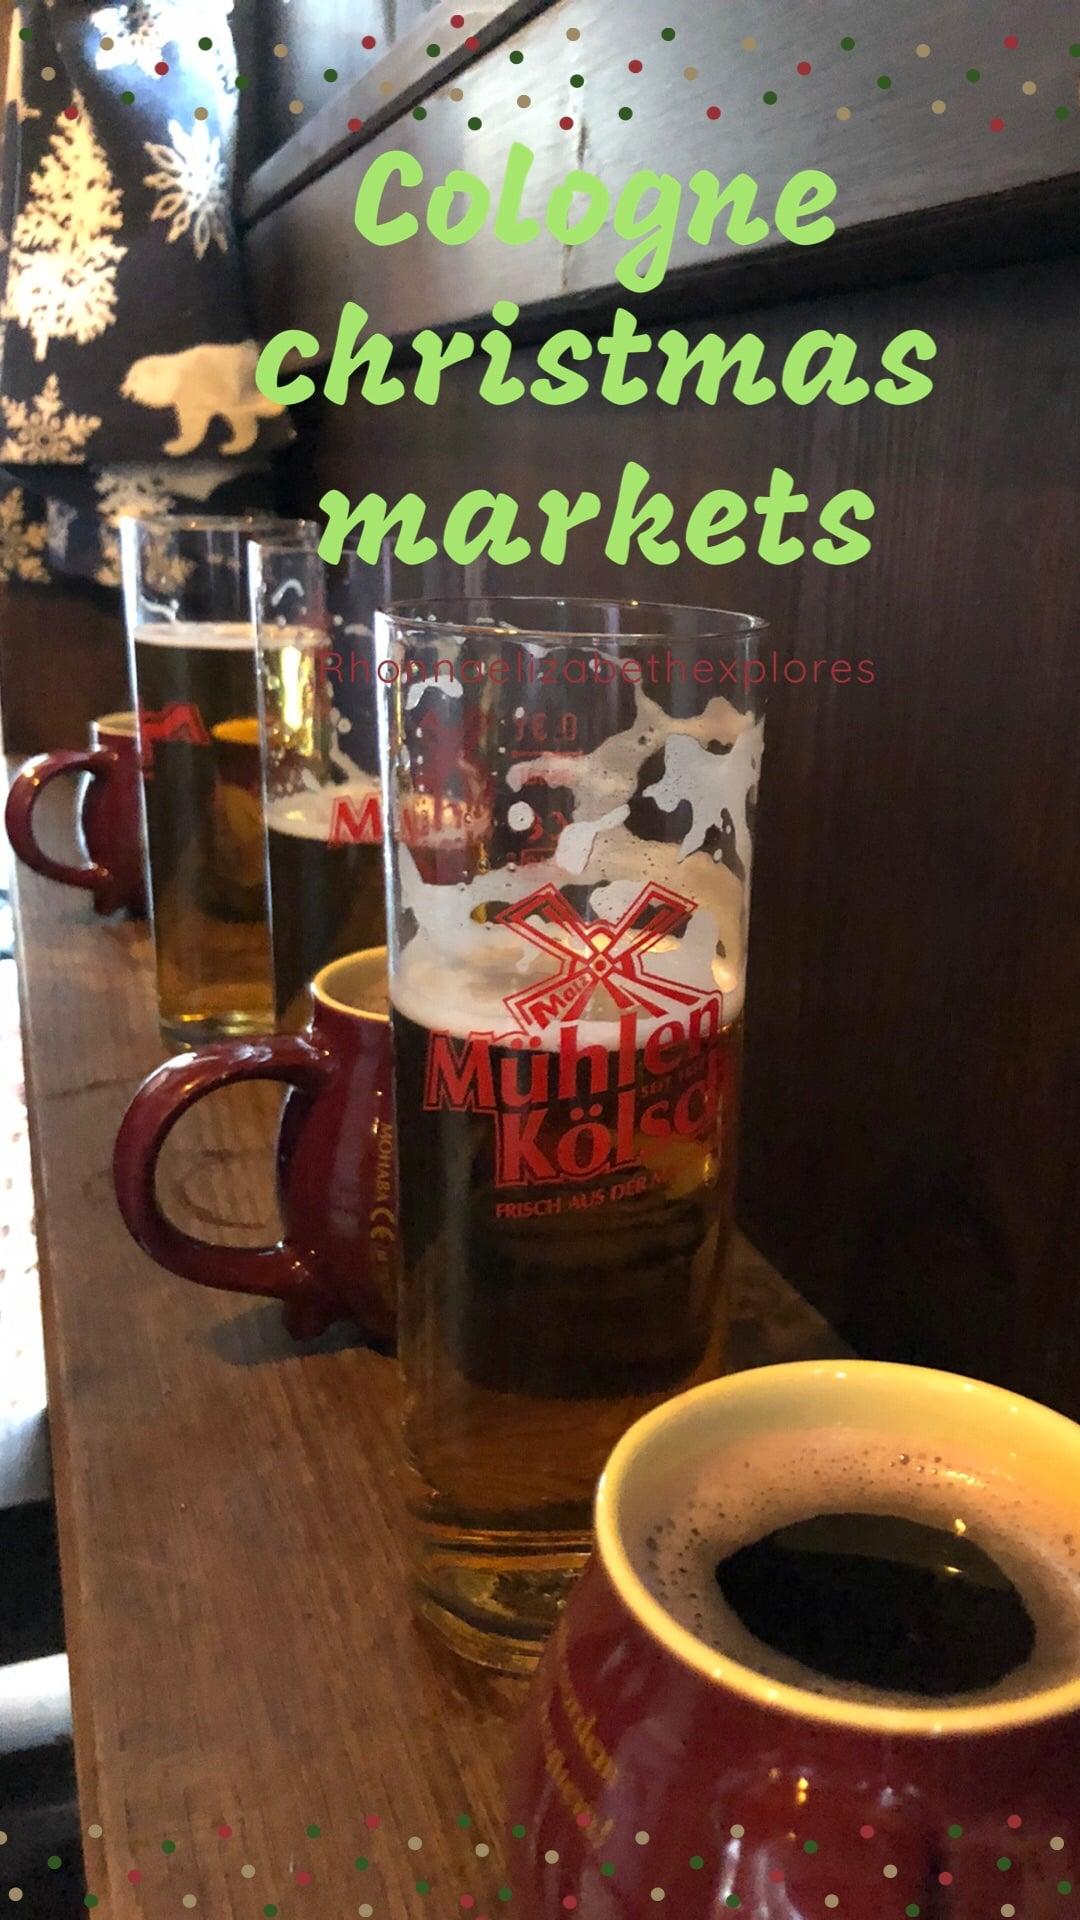 Cologne Christmas Markets pinterest